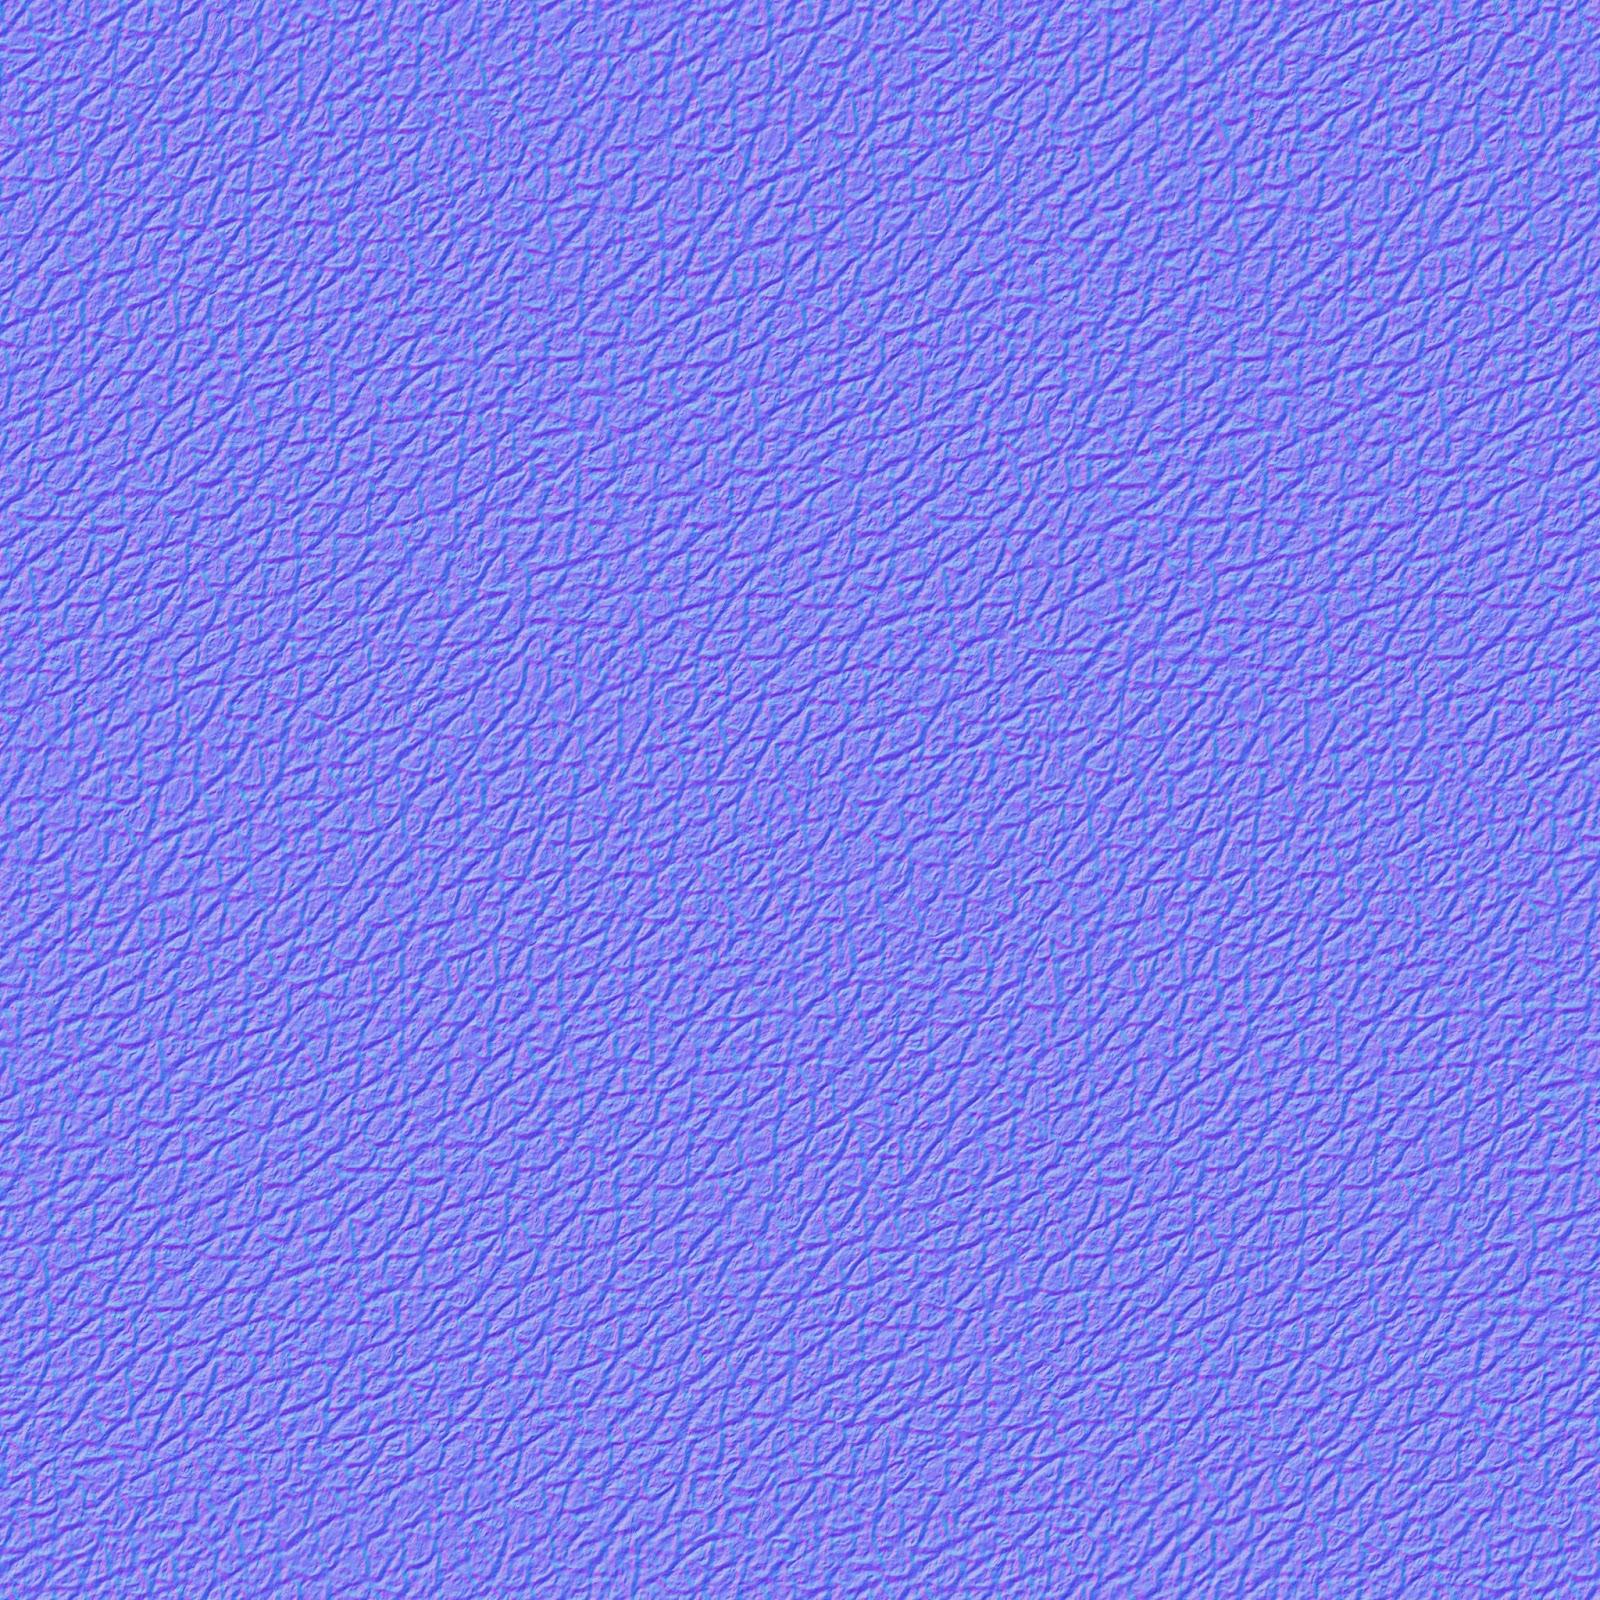 Seamless Black Leather Texture+ (Maps) | Texturise Free ...